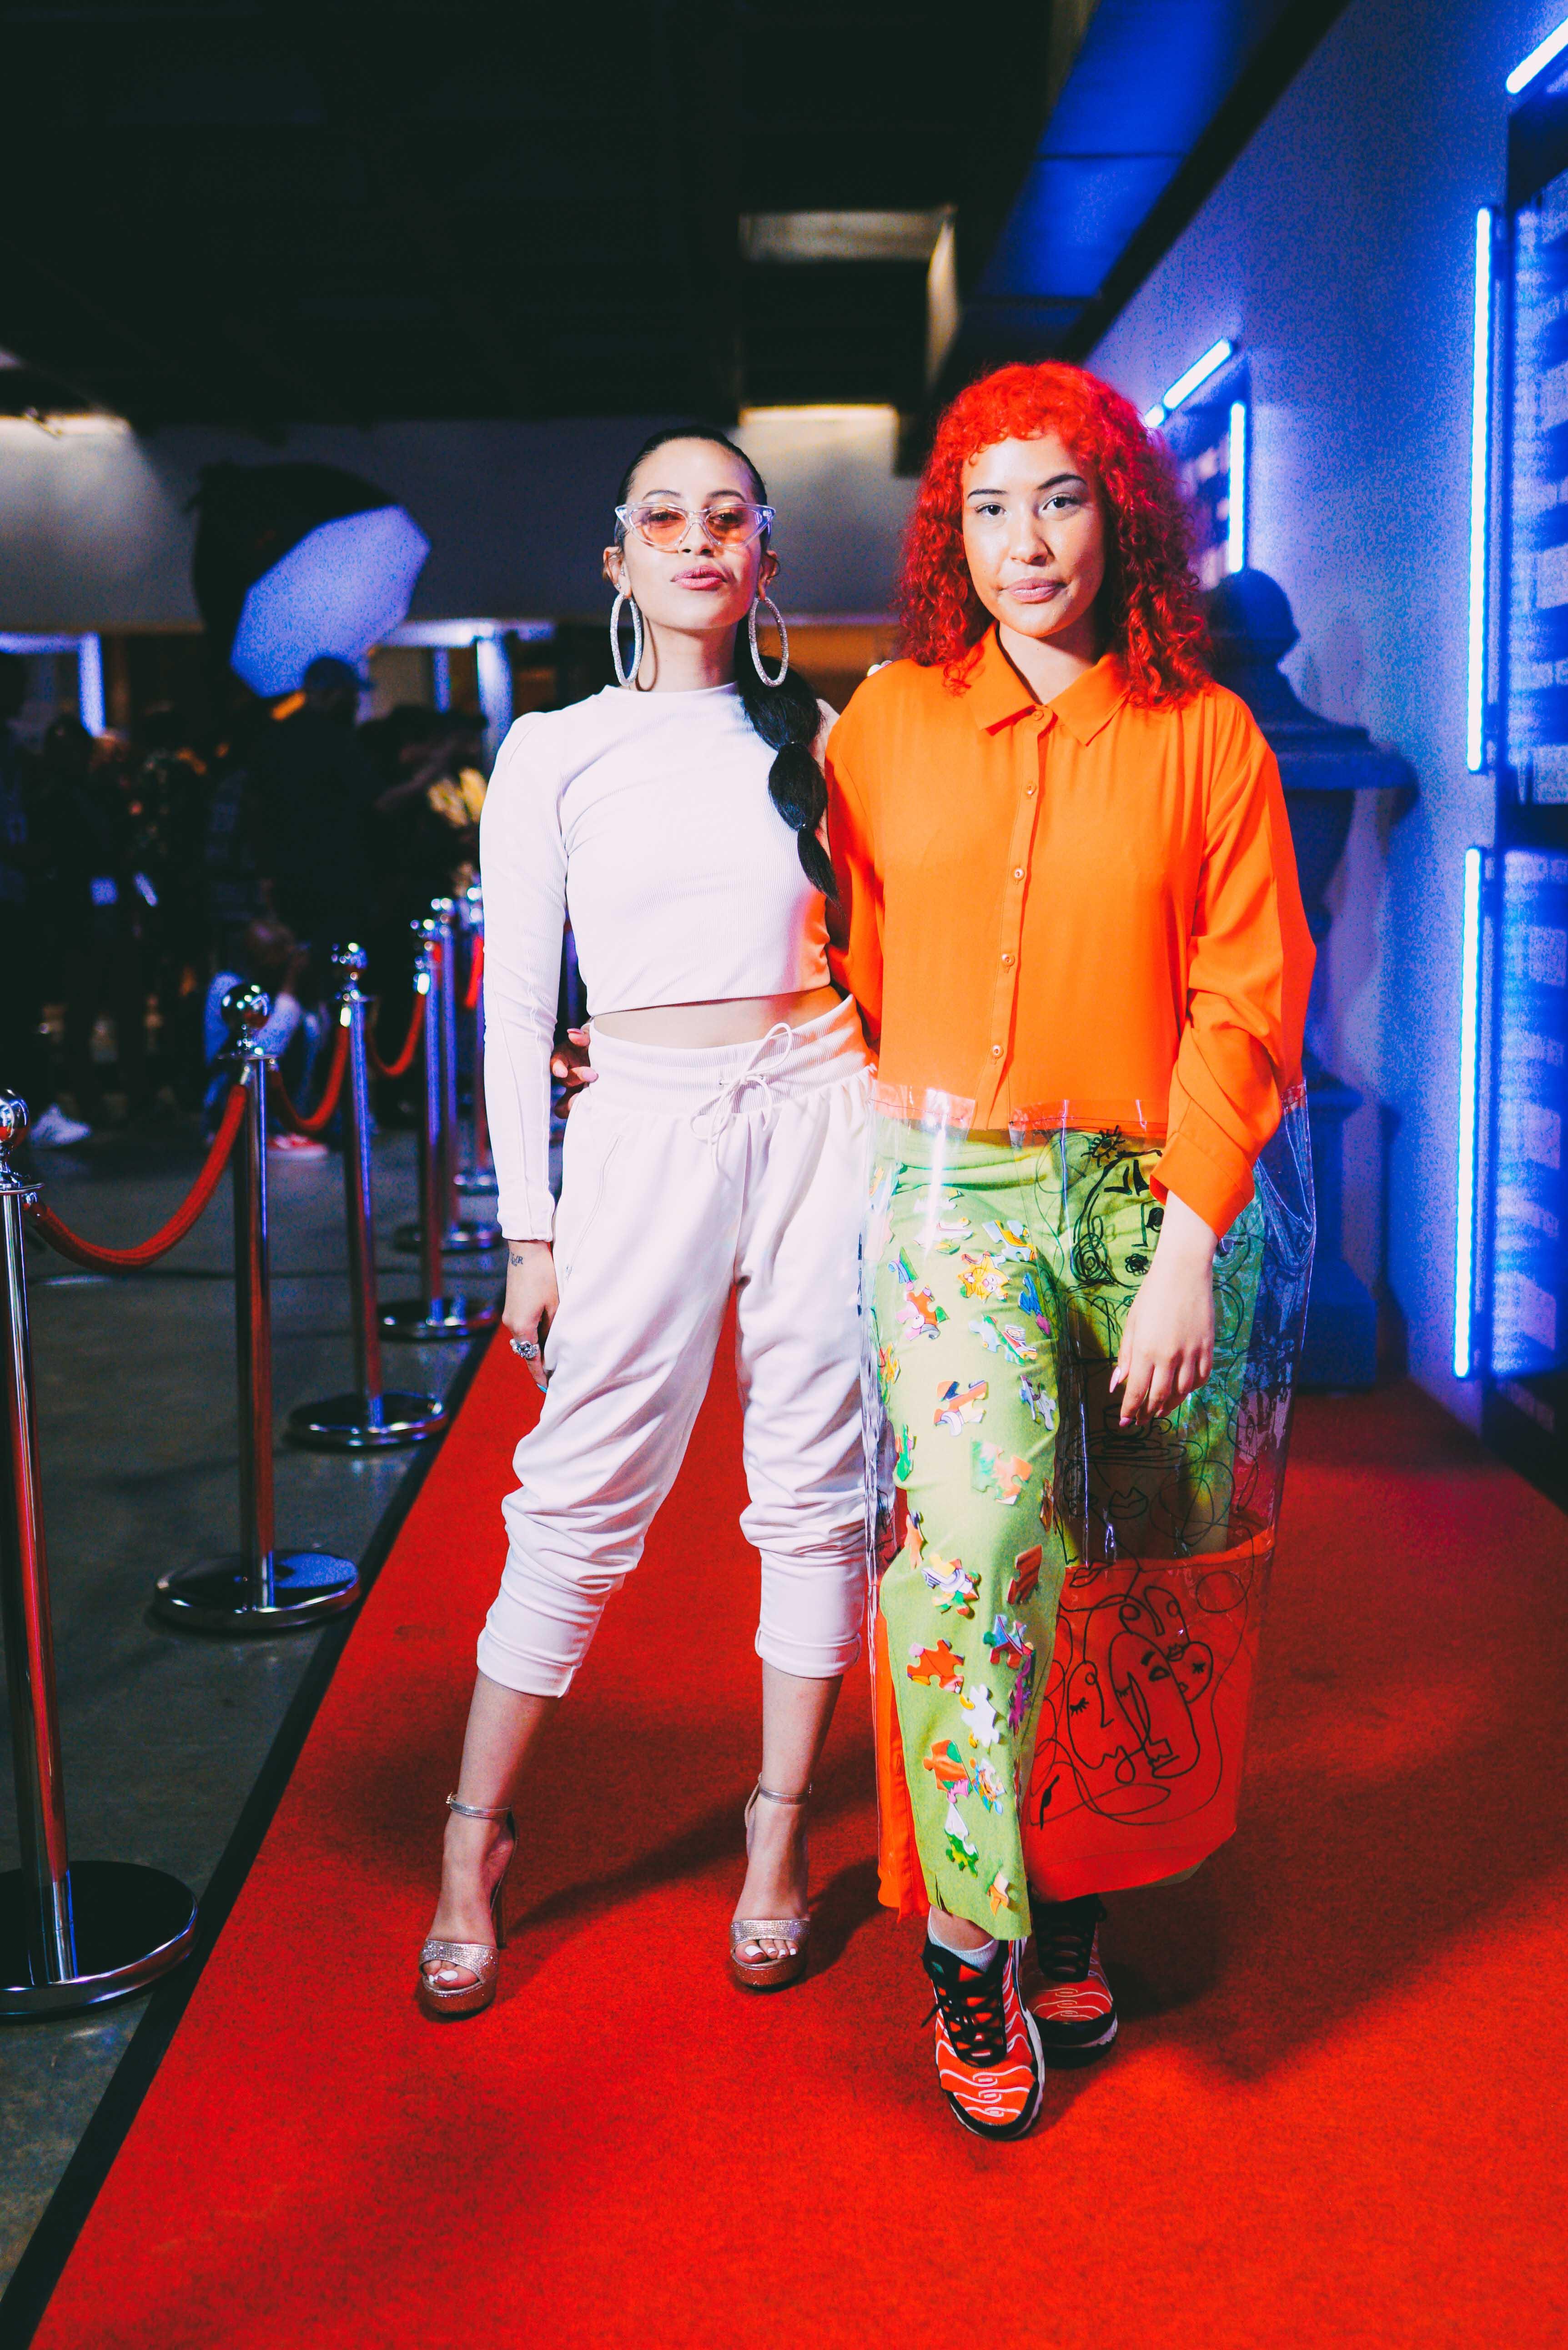 Très Stylish! The Boldest Visitor Fashion at AFI Johannesburg Trend Week Day 1